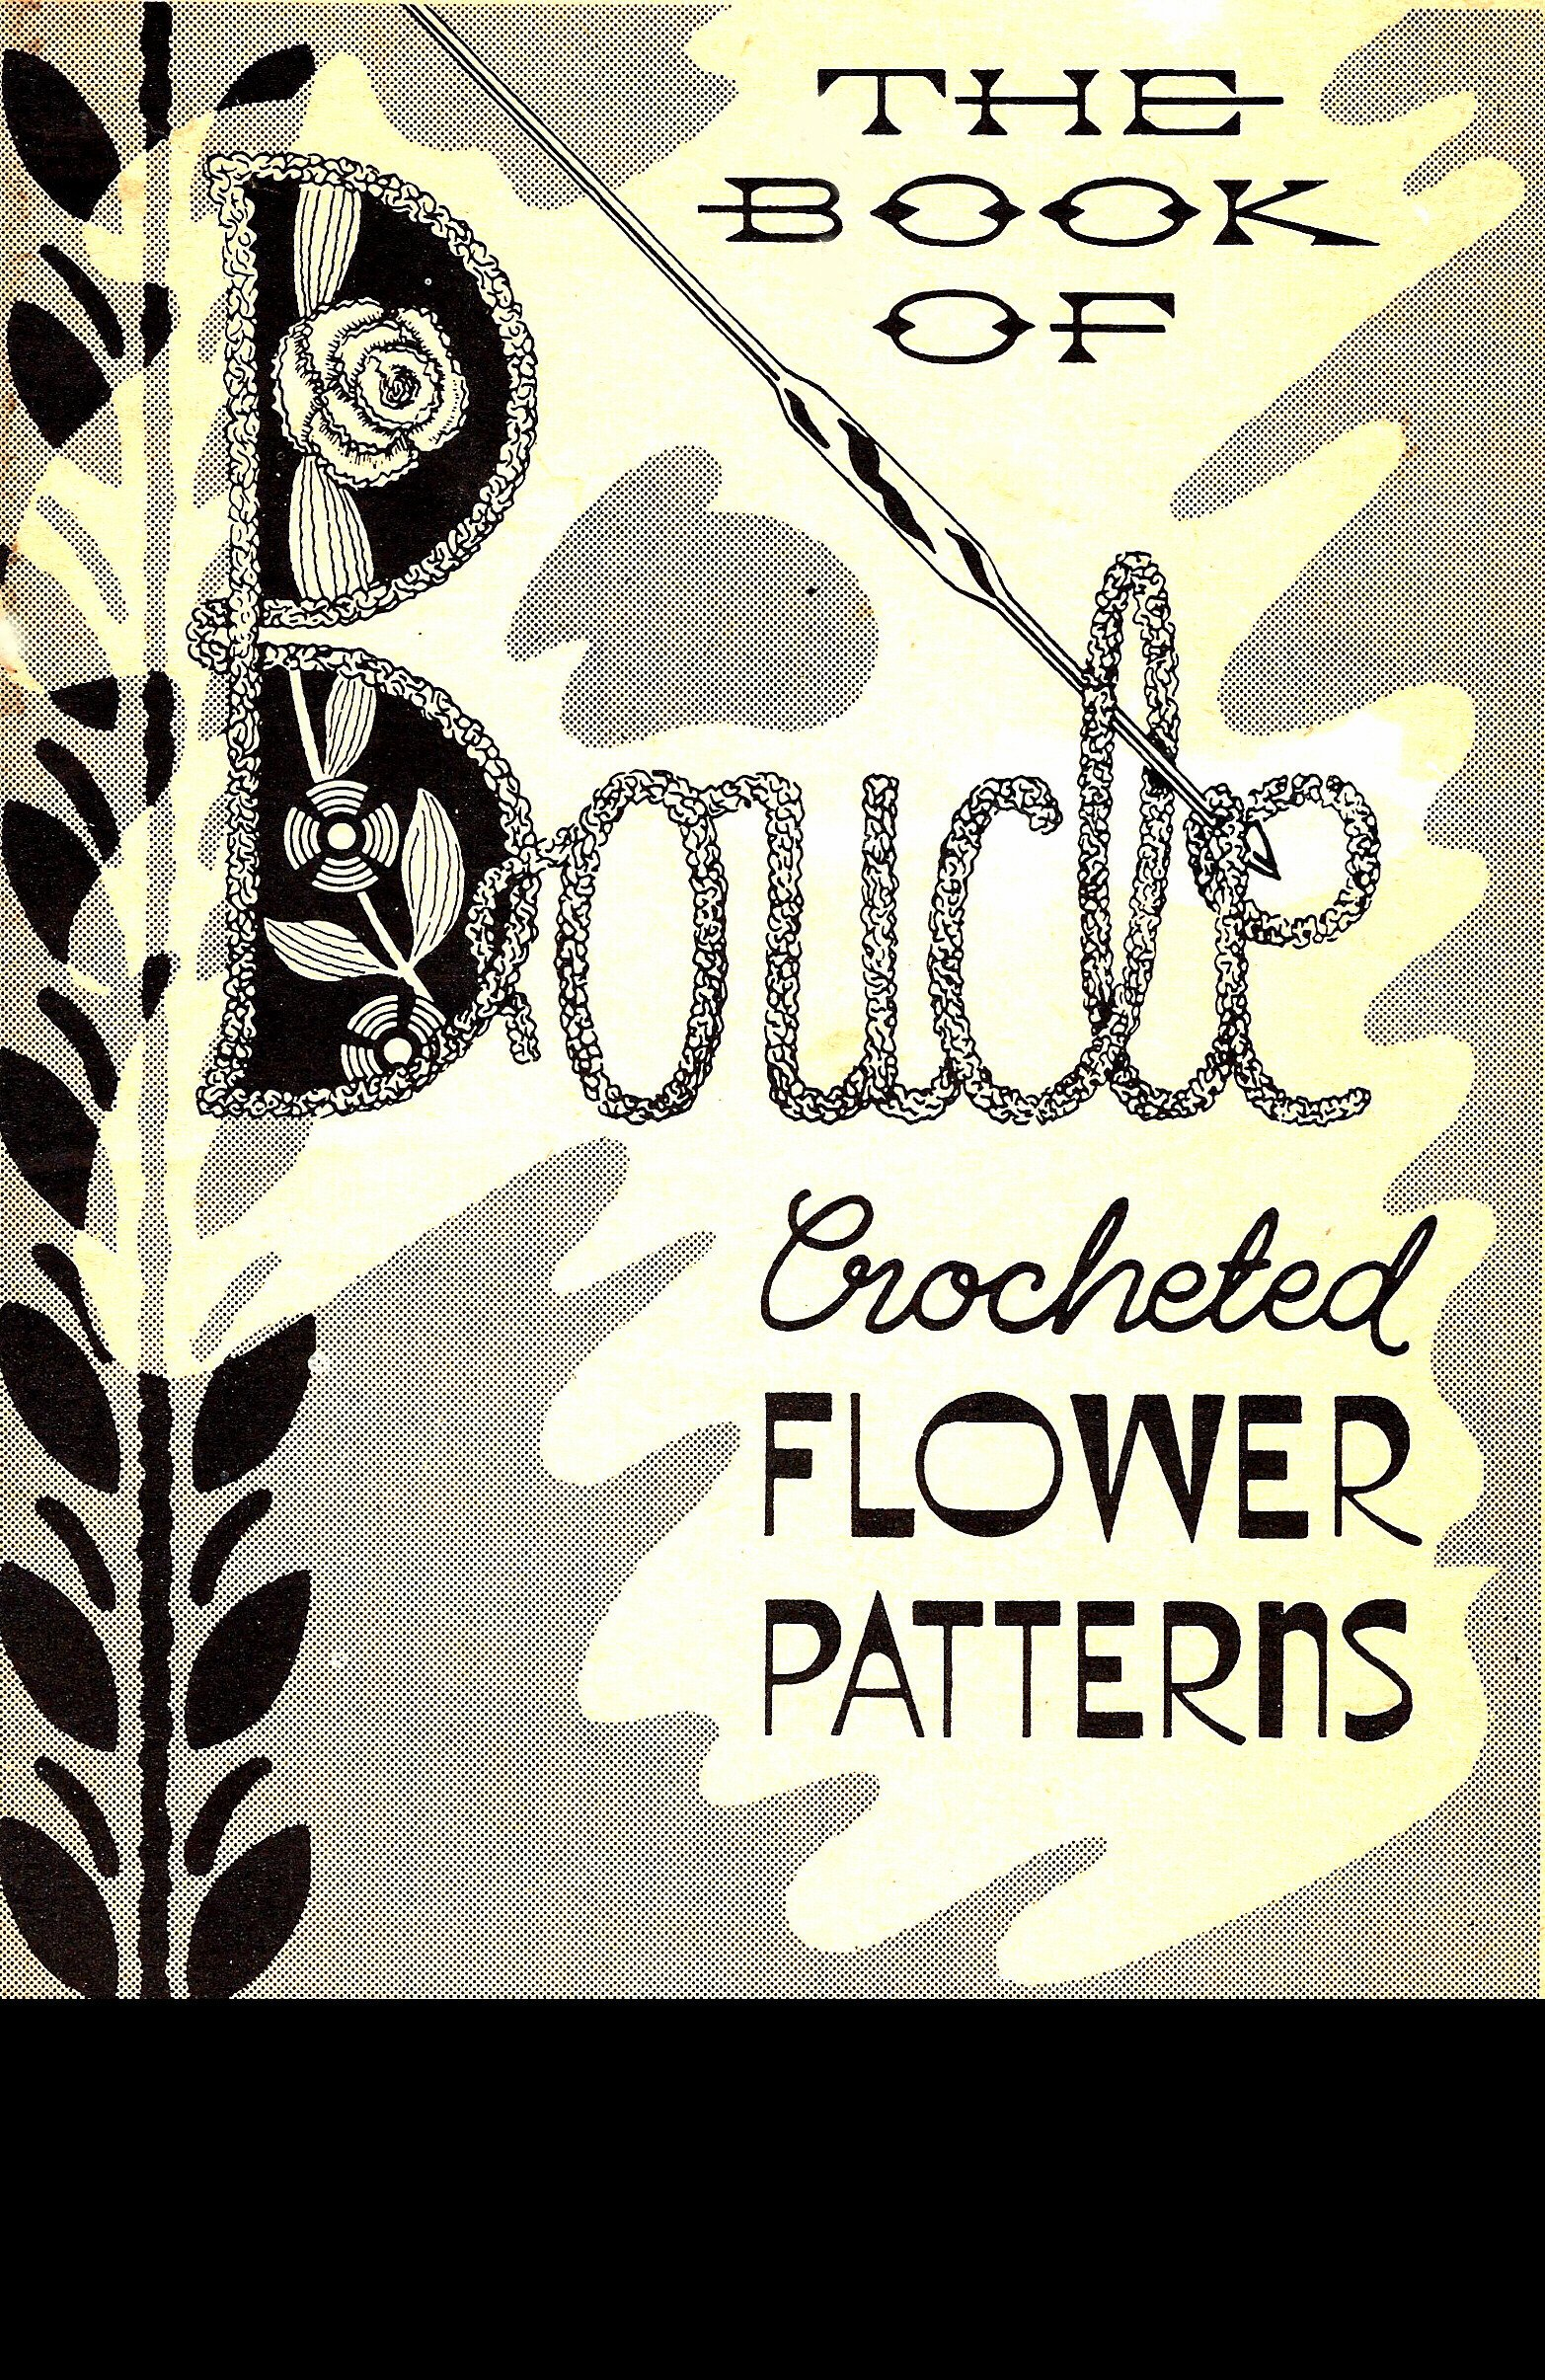 Cheap Vintage Crochet Patterns, find Vintage Crochet Patterns deals ...